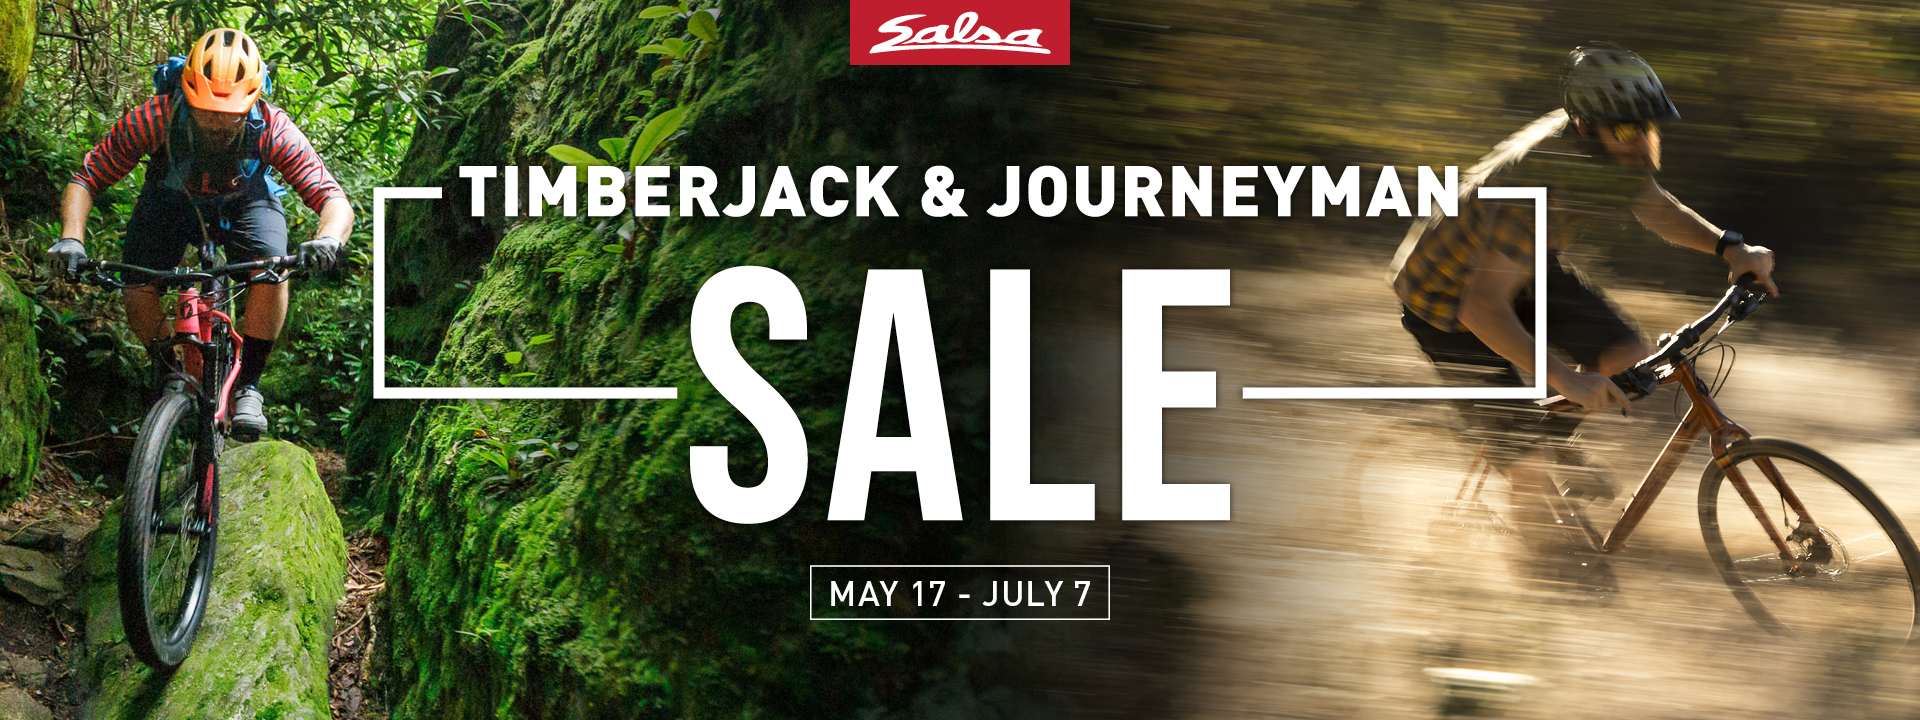 Salsa_Timberjack_Journeyman_Homepage_Header.jpg